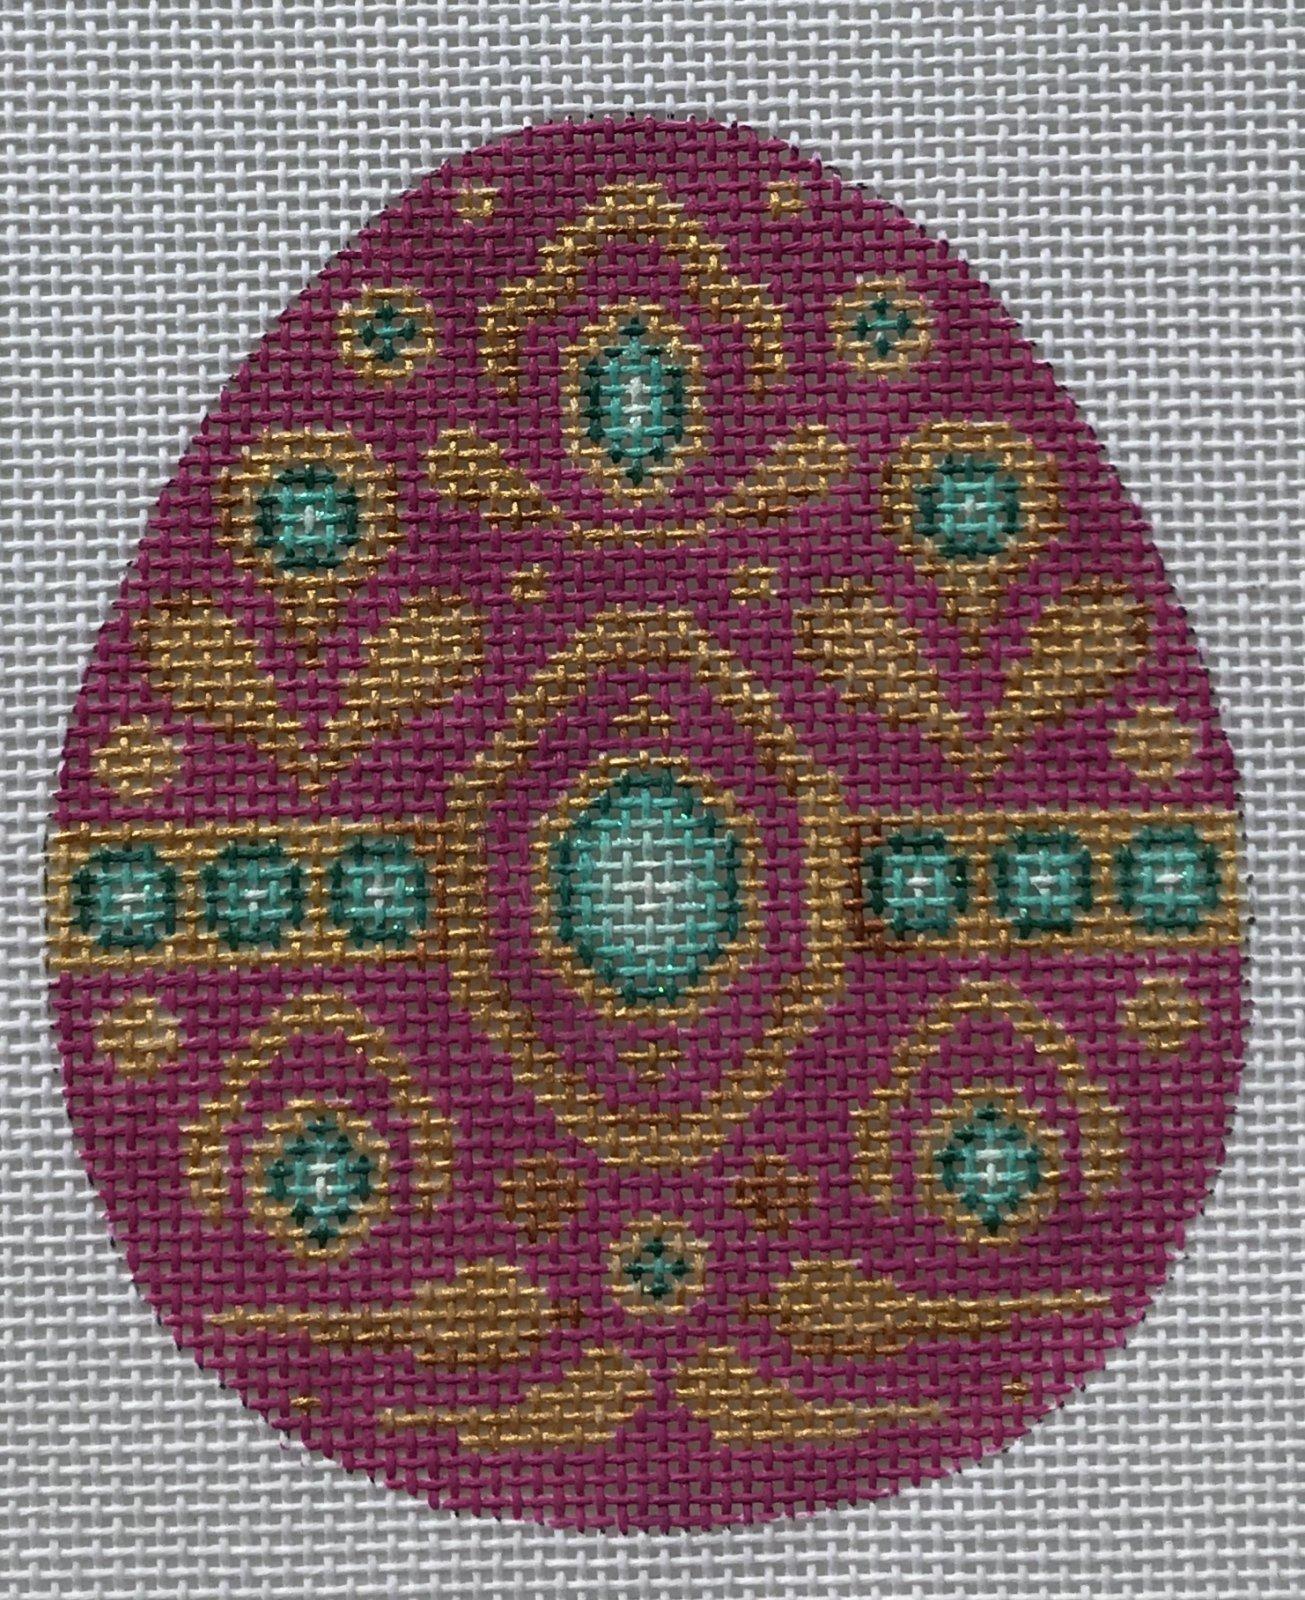 BB/2693 Jeweled Egg - Magenta & Gold